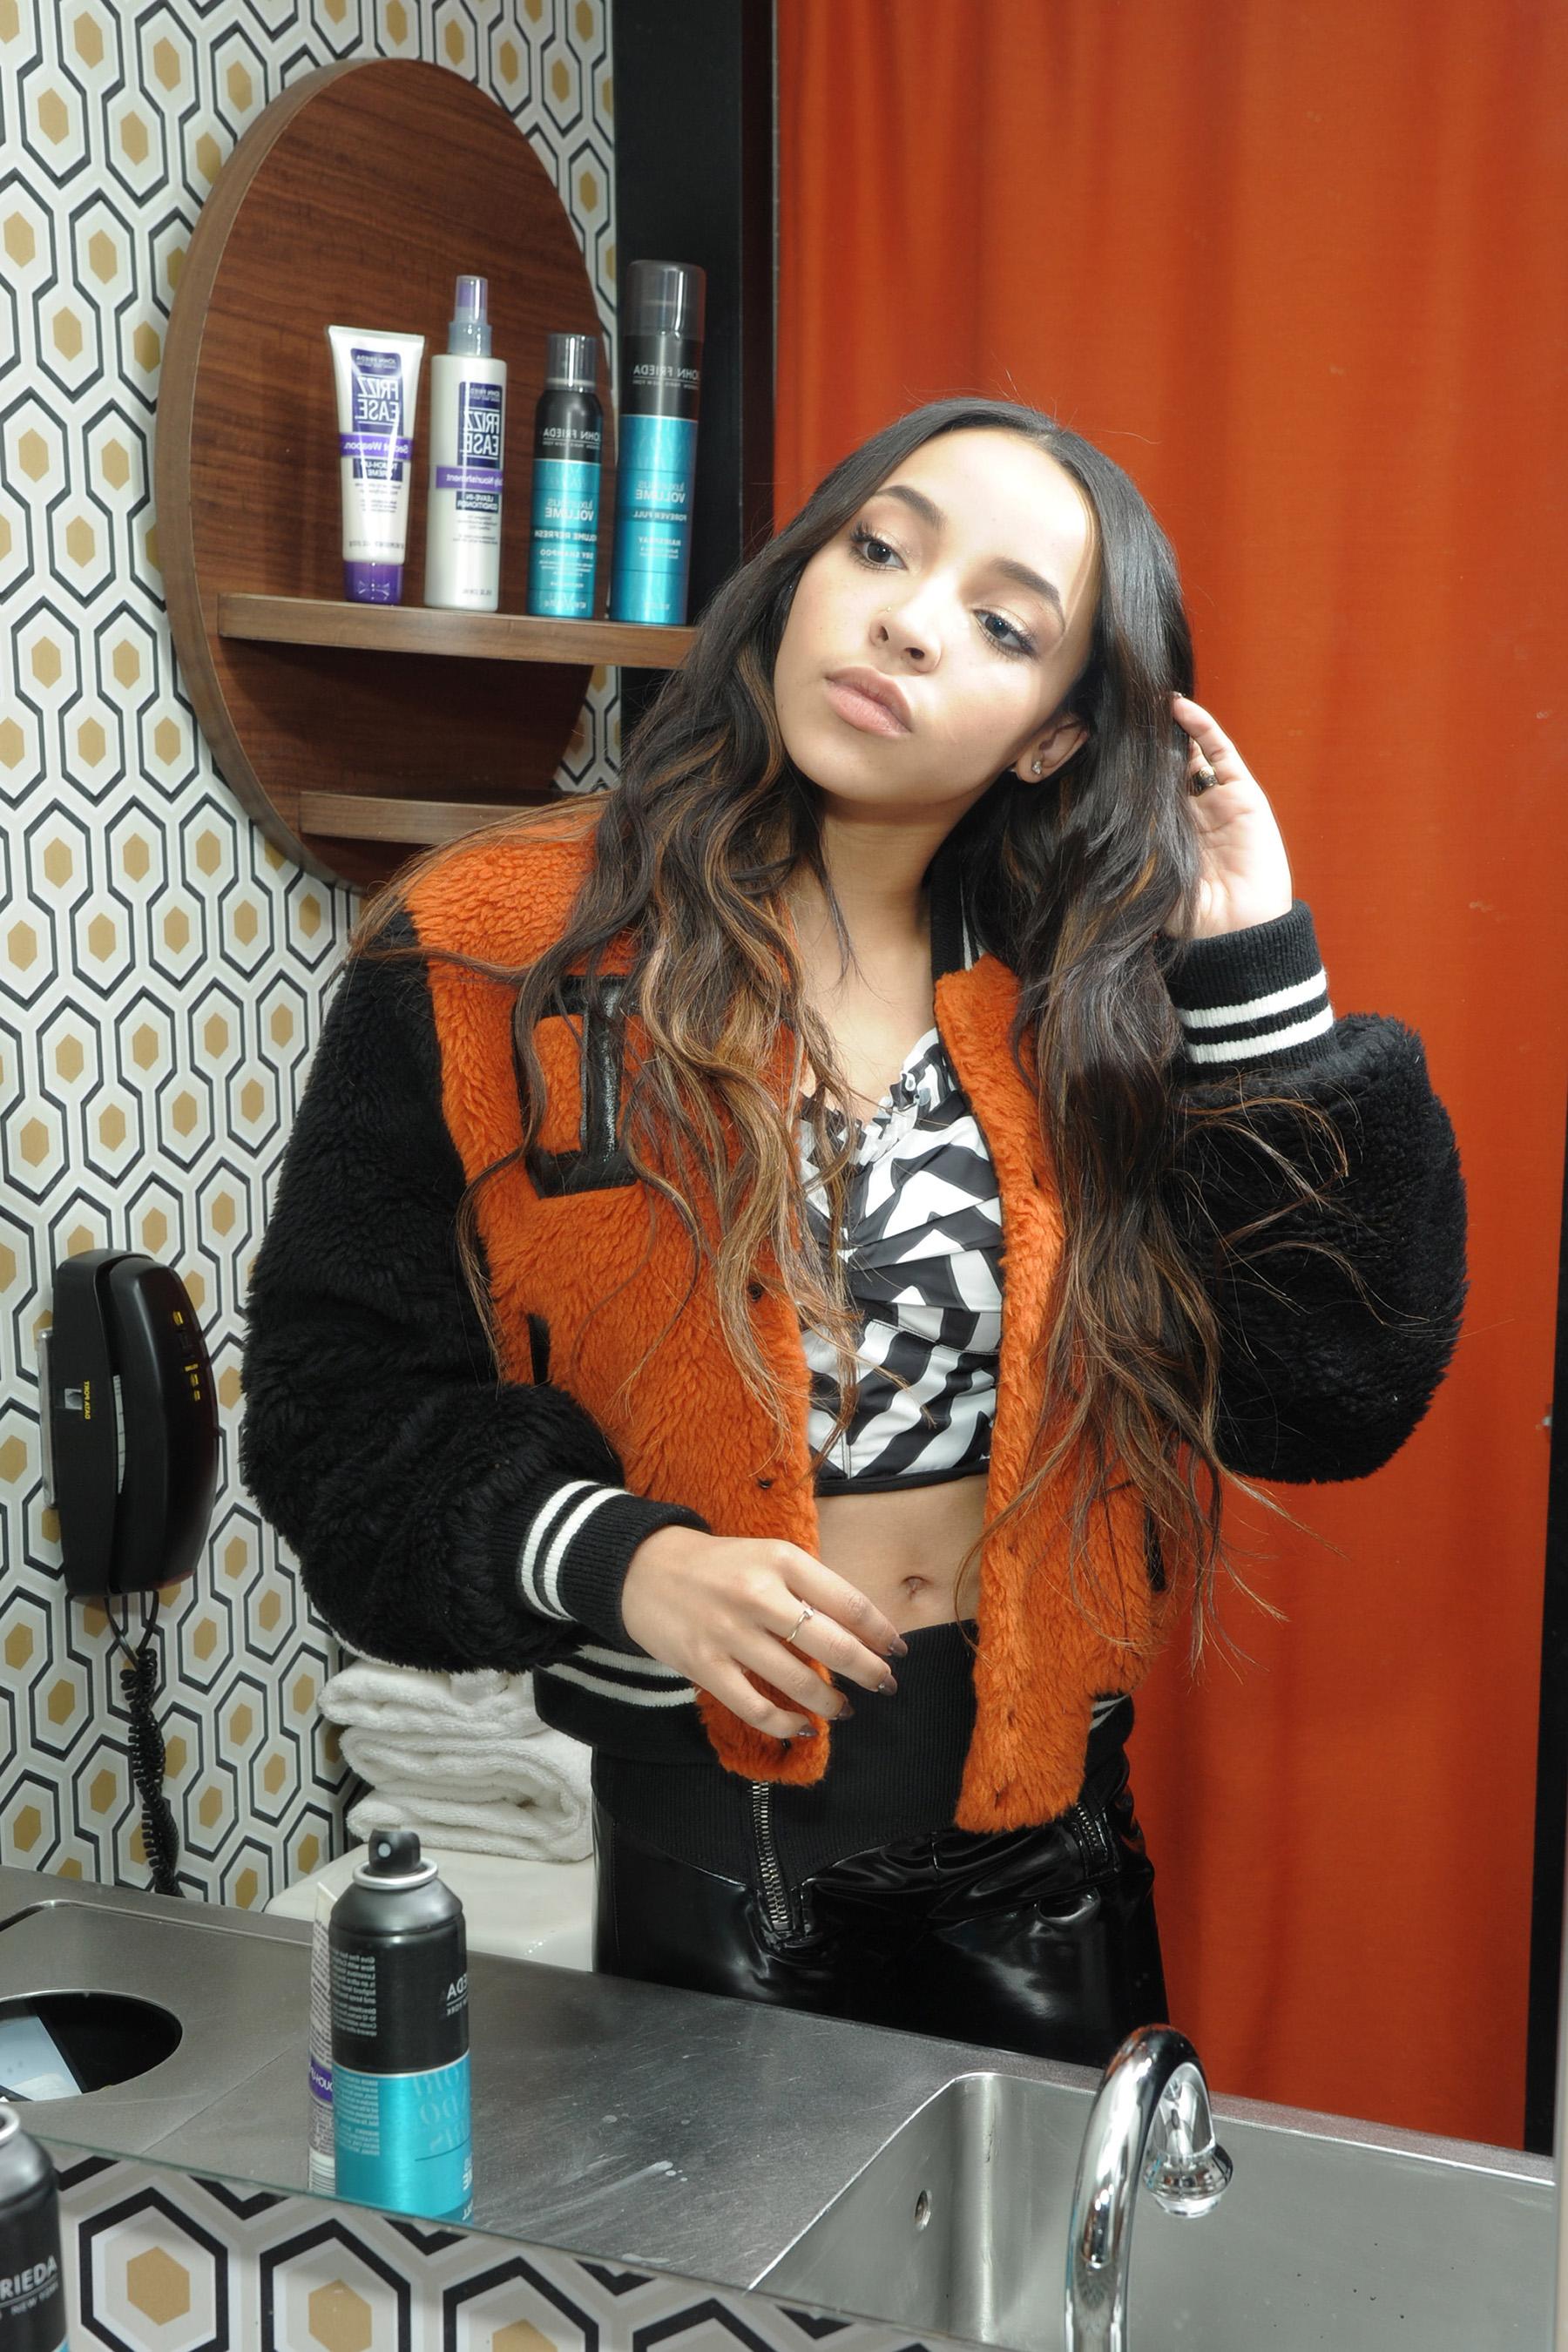 John Frieda Разглаживающий шампунь для прямых волос Frizz Ease Flawlessly Straight, 250 мл